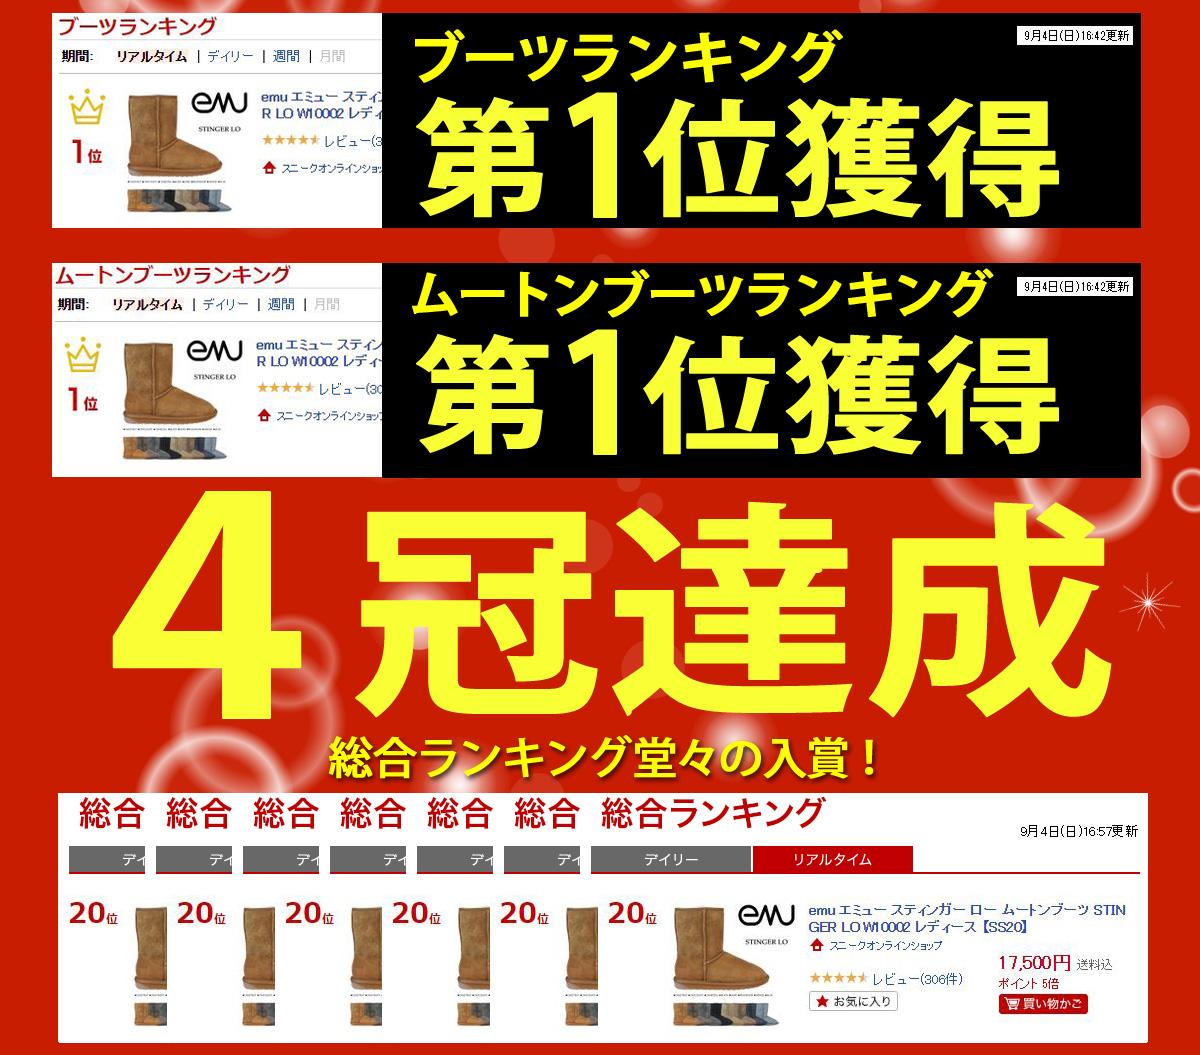 emuエミュースティンガーロームートンブーツSTINGERLOW10002レディース【SS20】